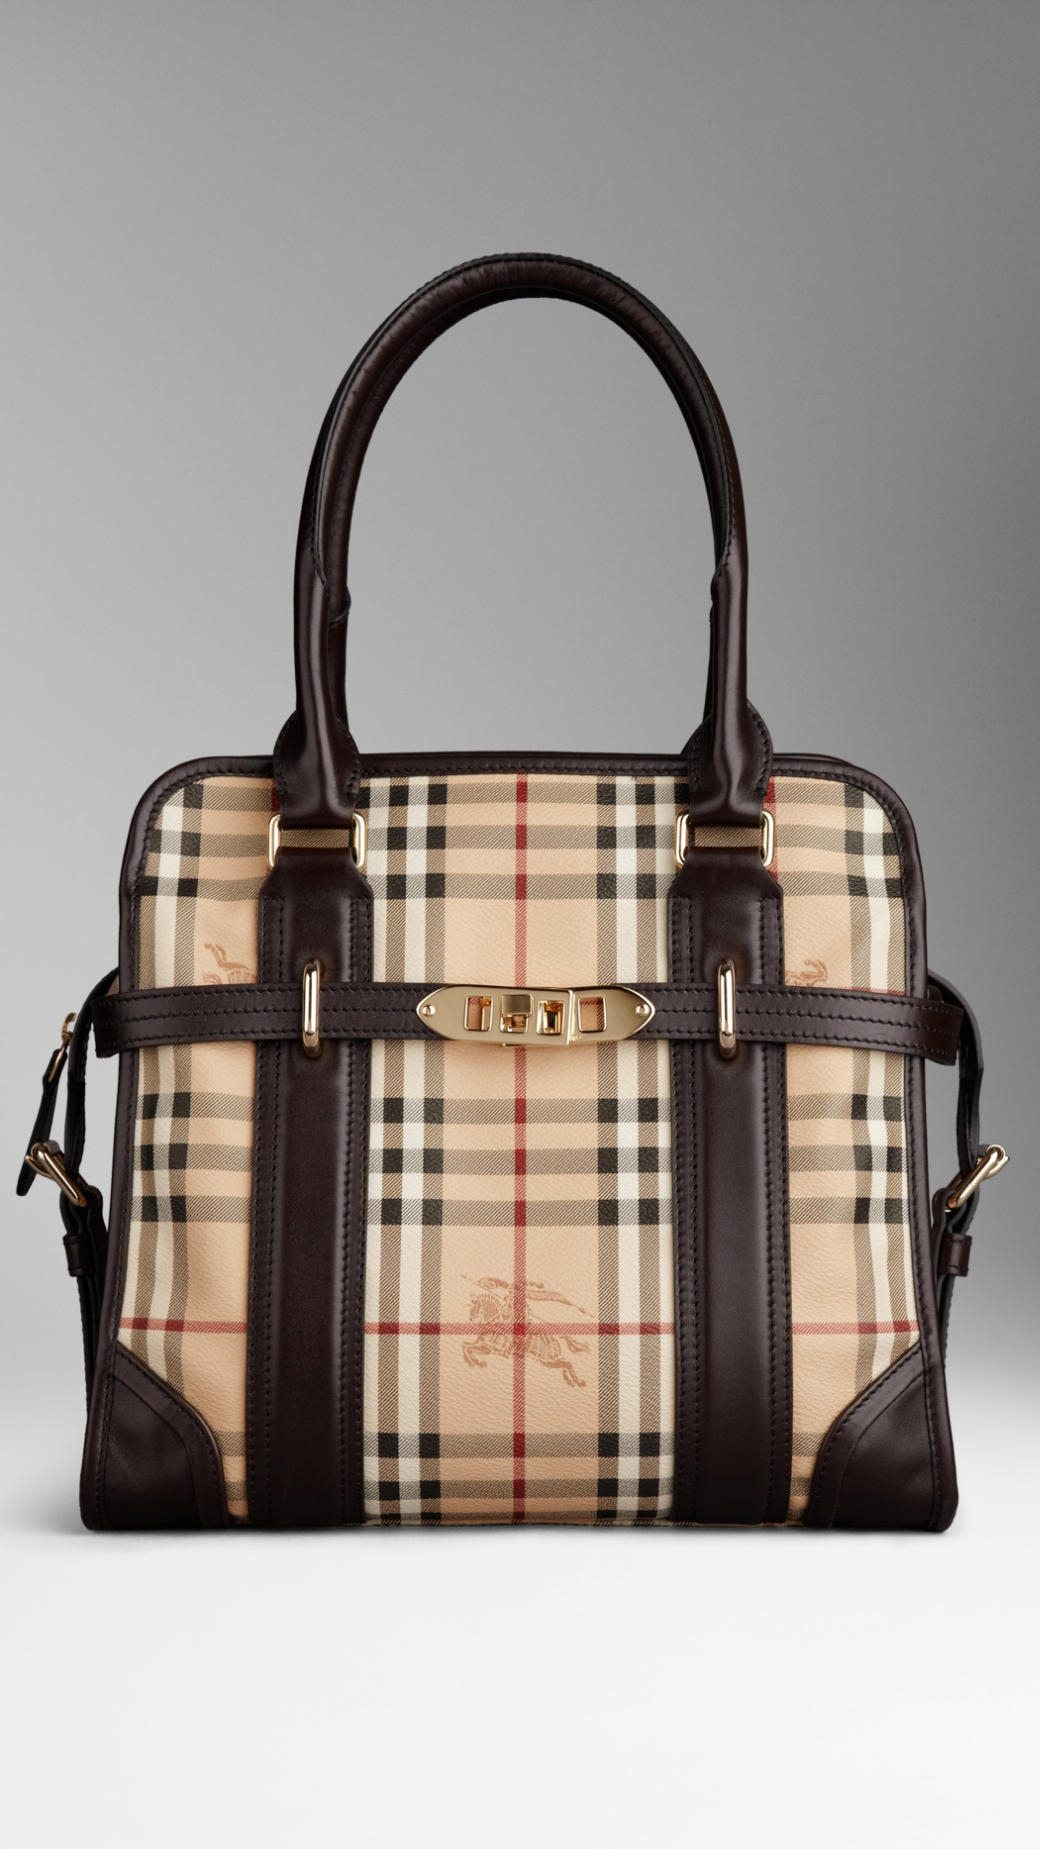 Lyst - Burberry Medium Haymarket Check Portrait Tote Bag in Natural 3ebb8fce14